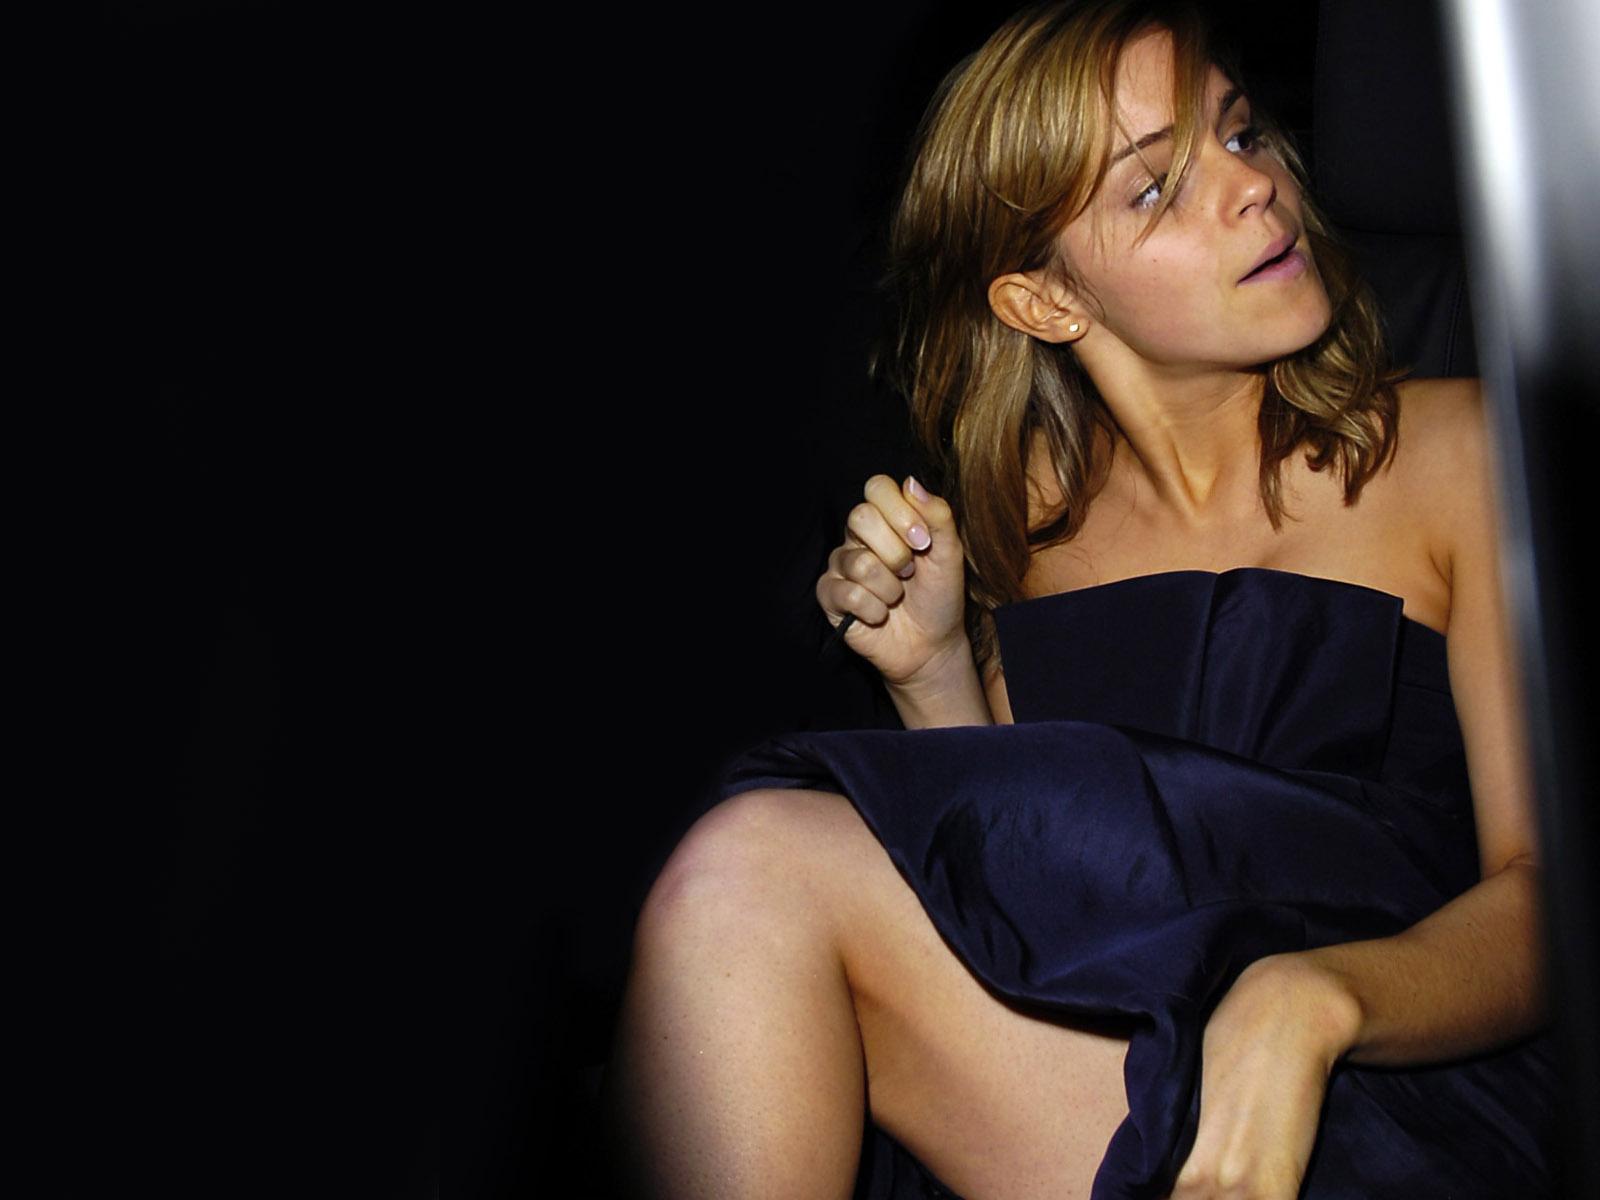 Emma Watsons Personal Parts: Emma Watson HD Wallpapers Part 9